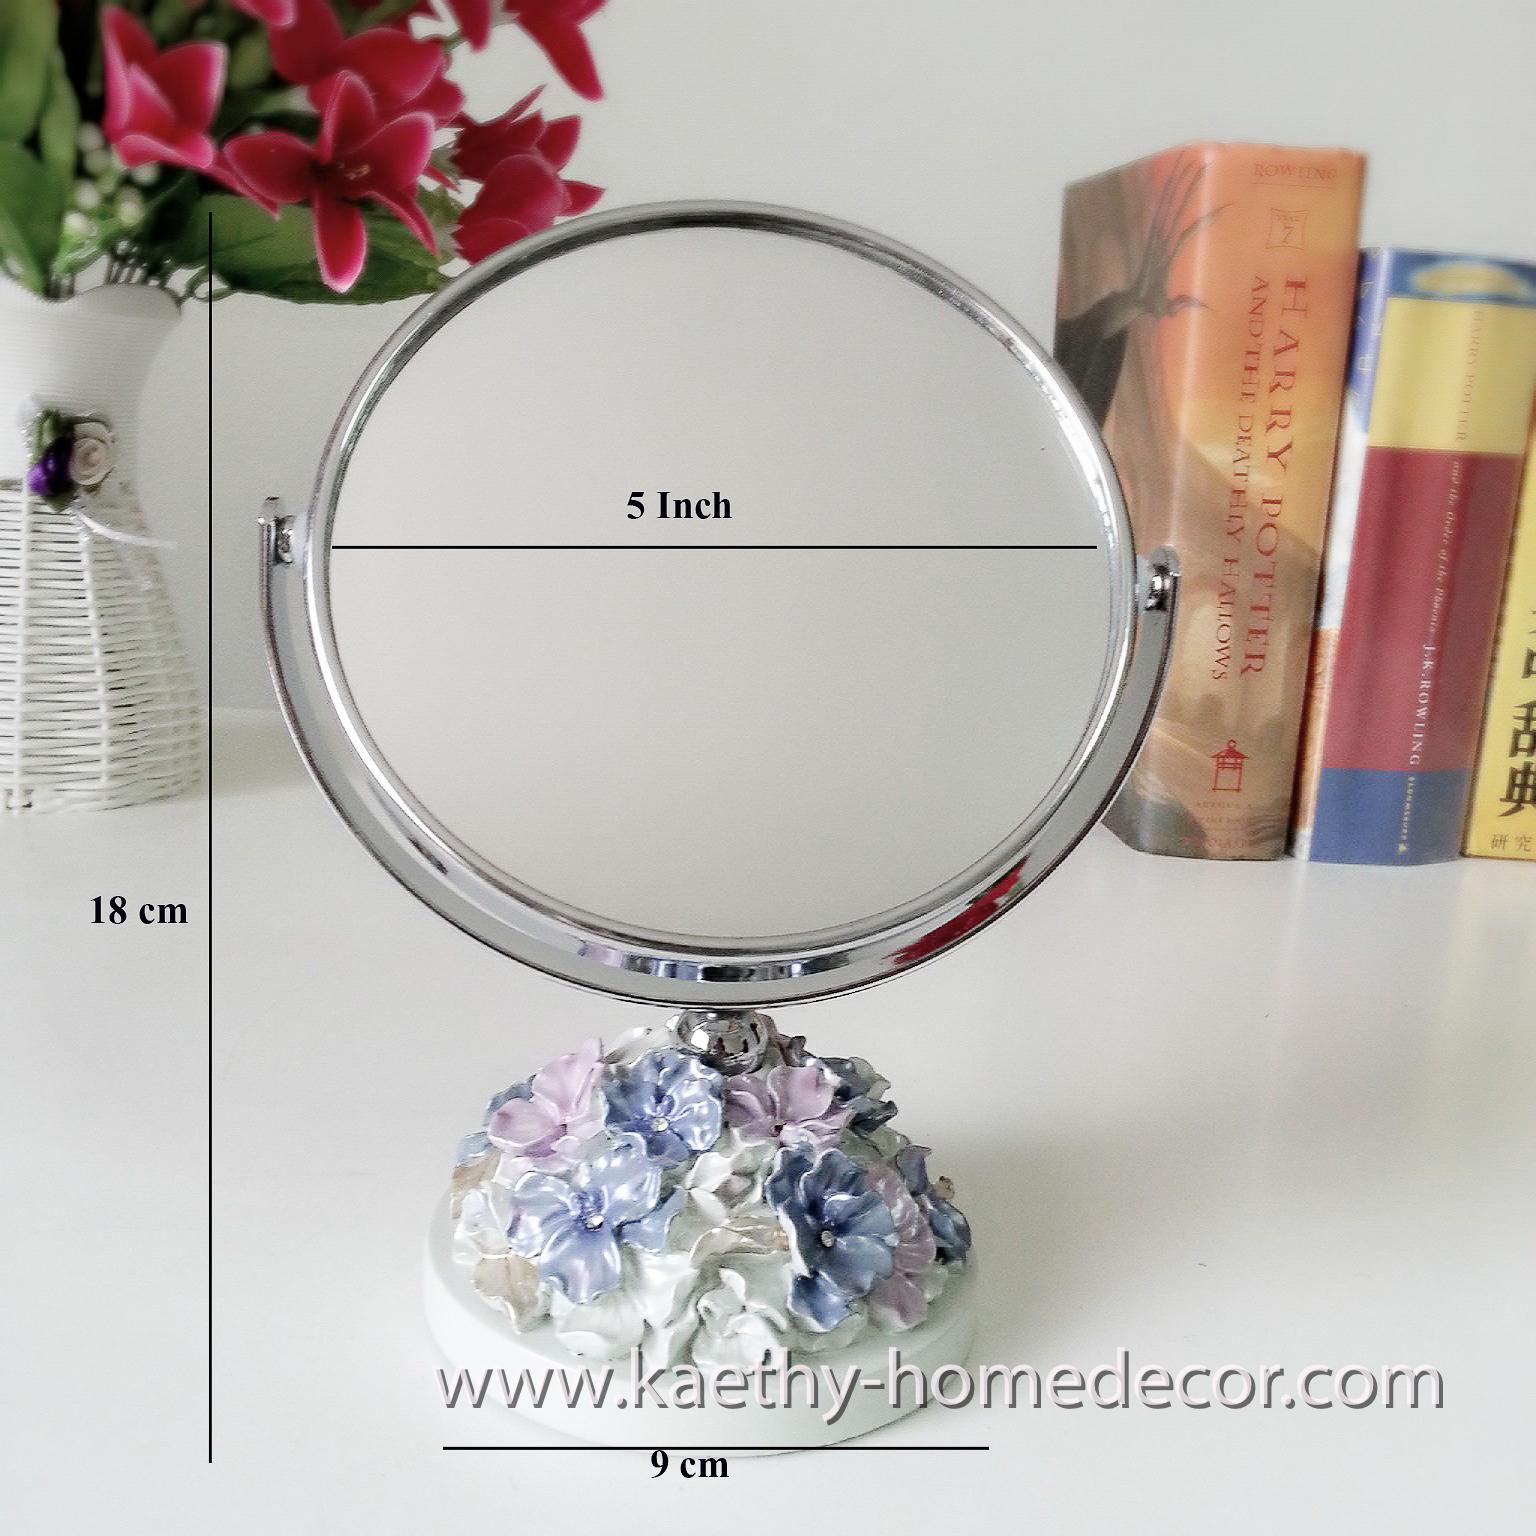 Round Mirror Style Design F2 Dia 5 Inch